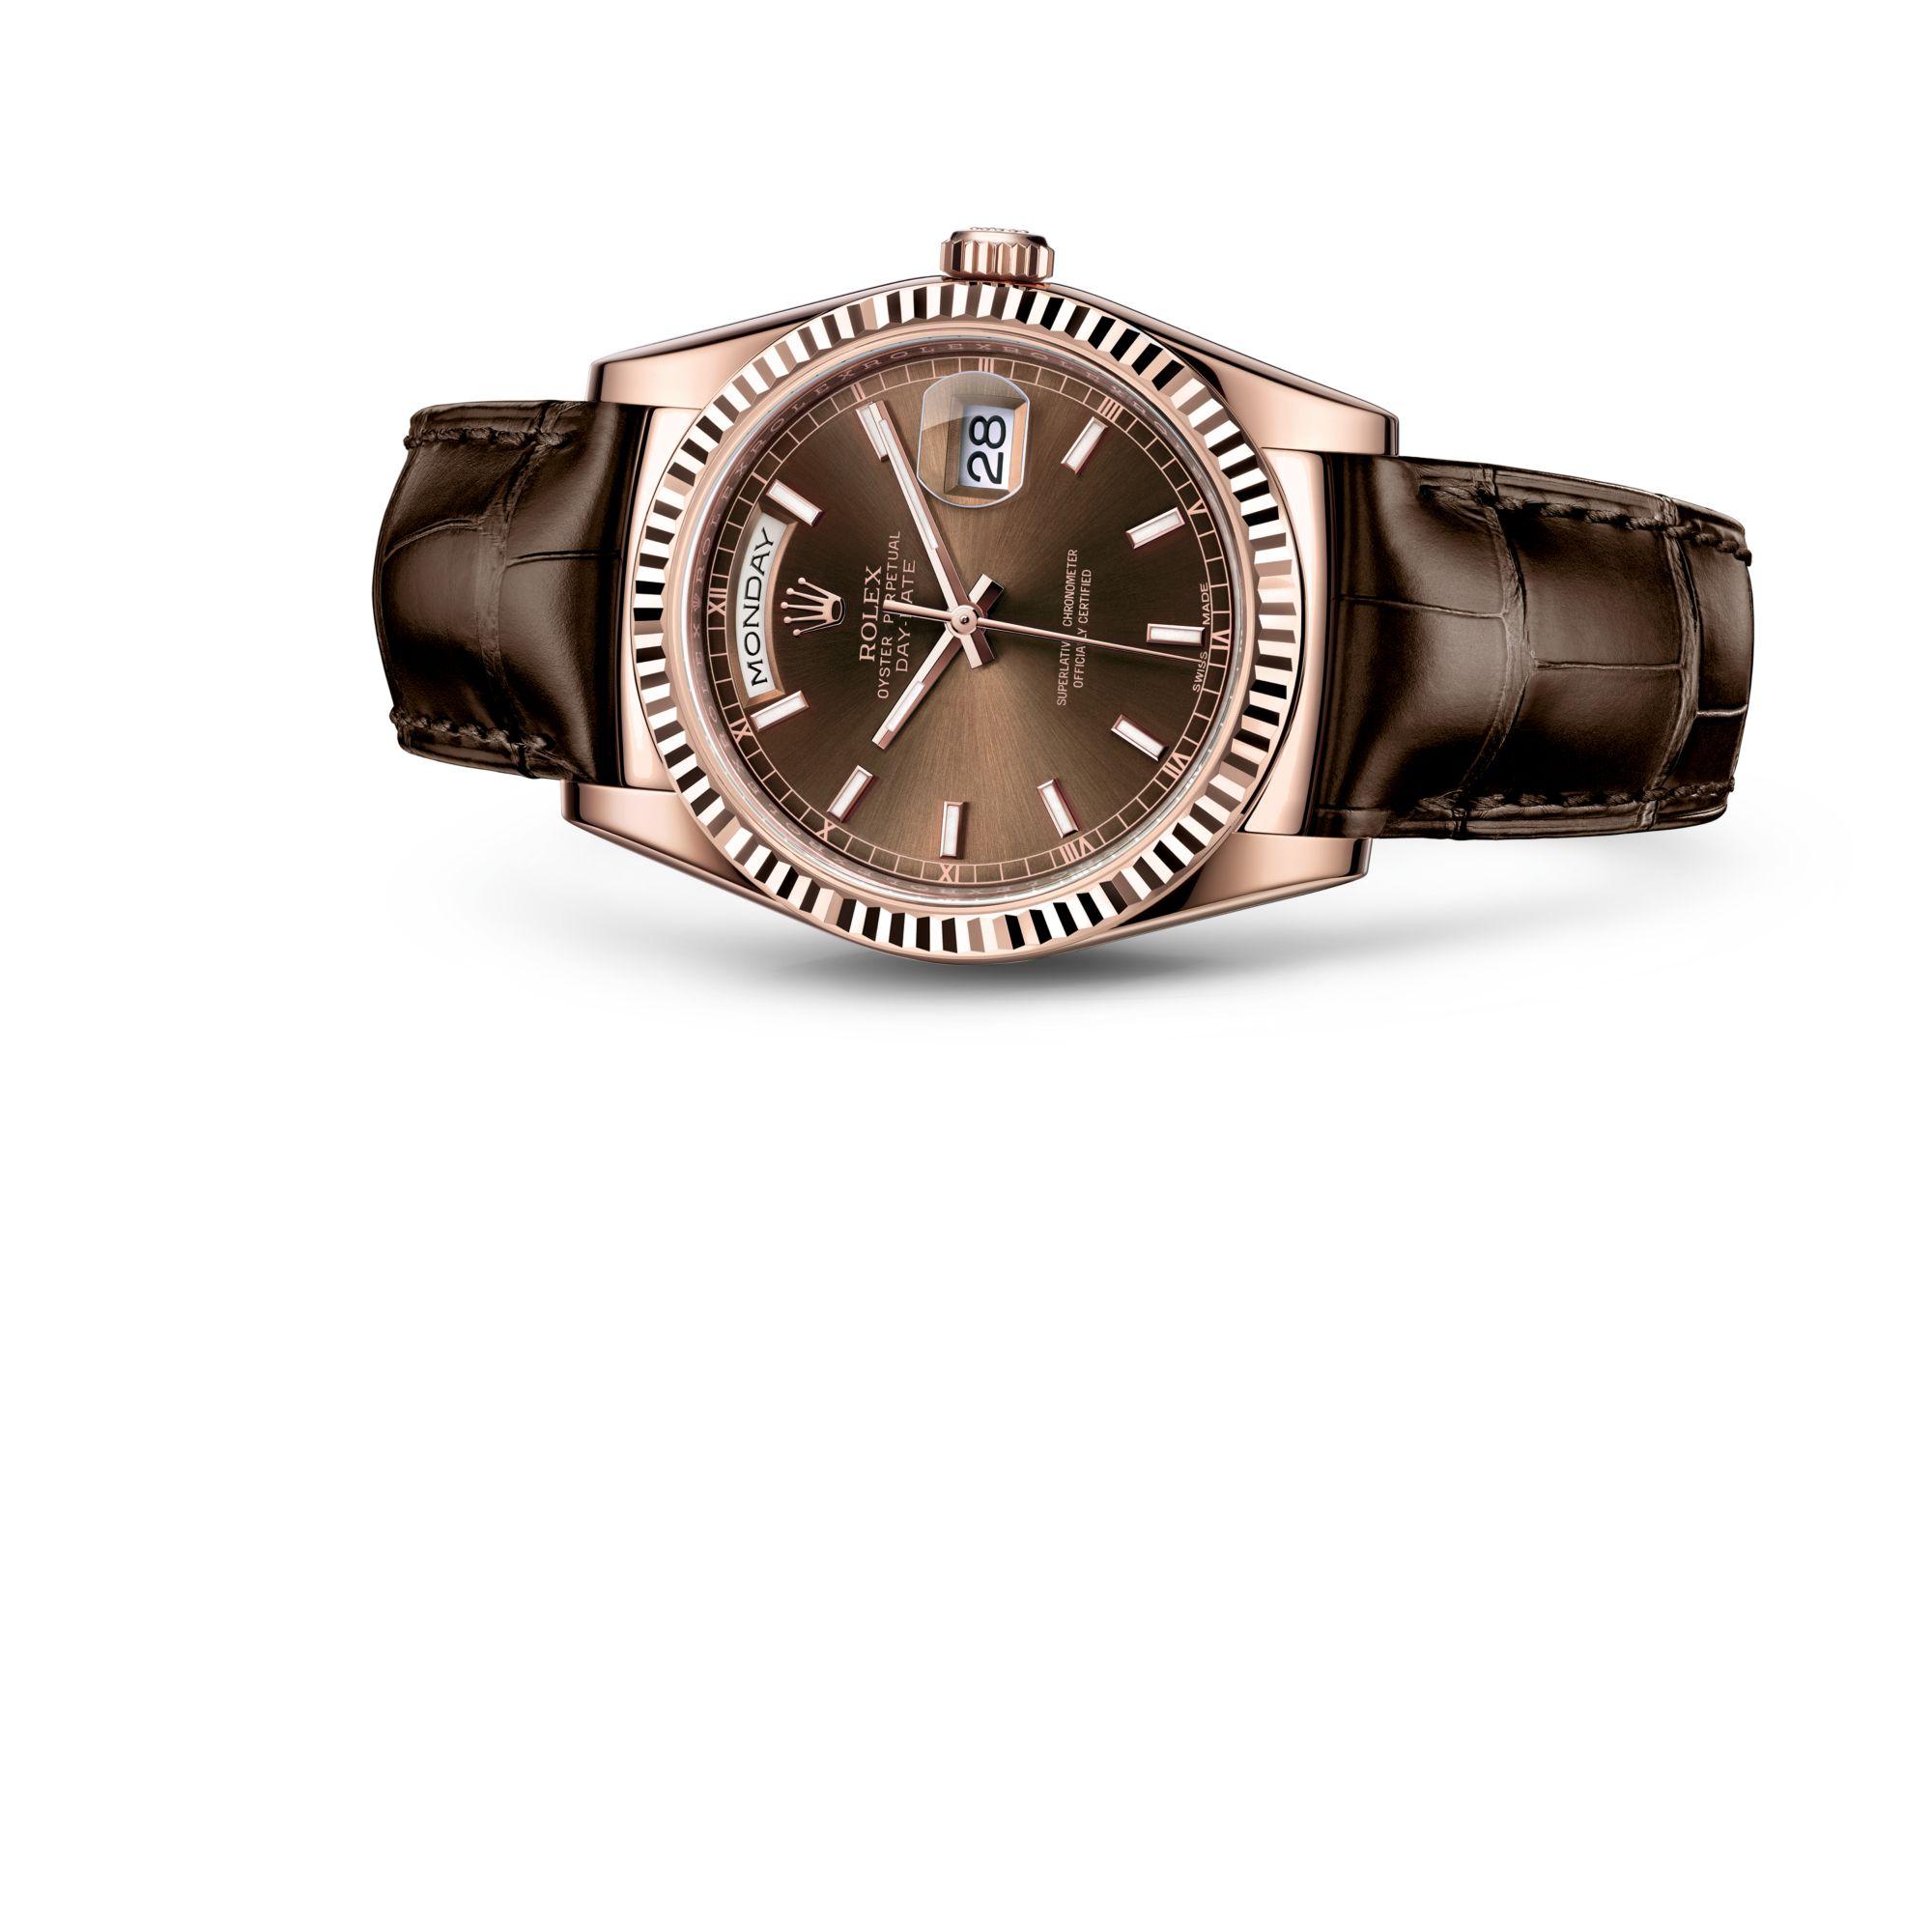 Rolex داي ديت ۳٦ M118135-0003